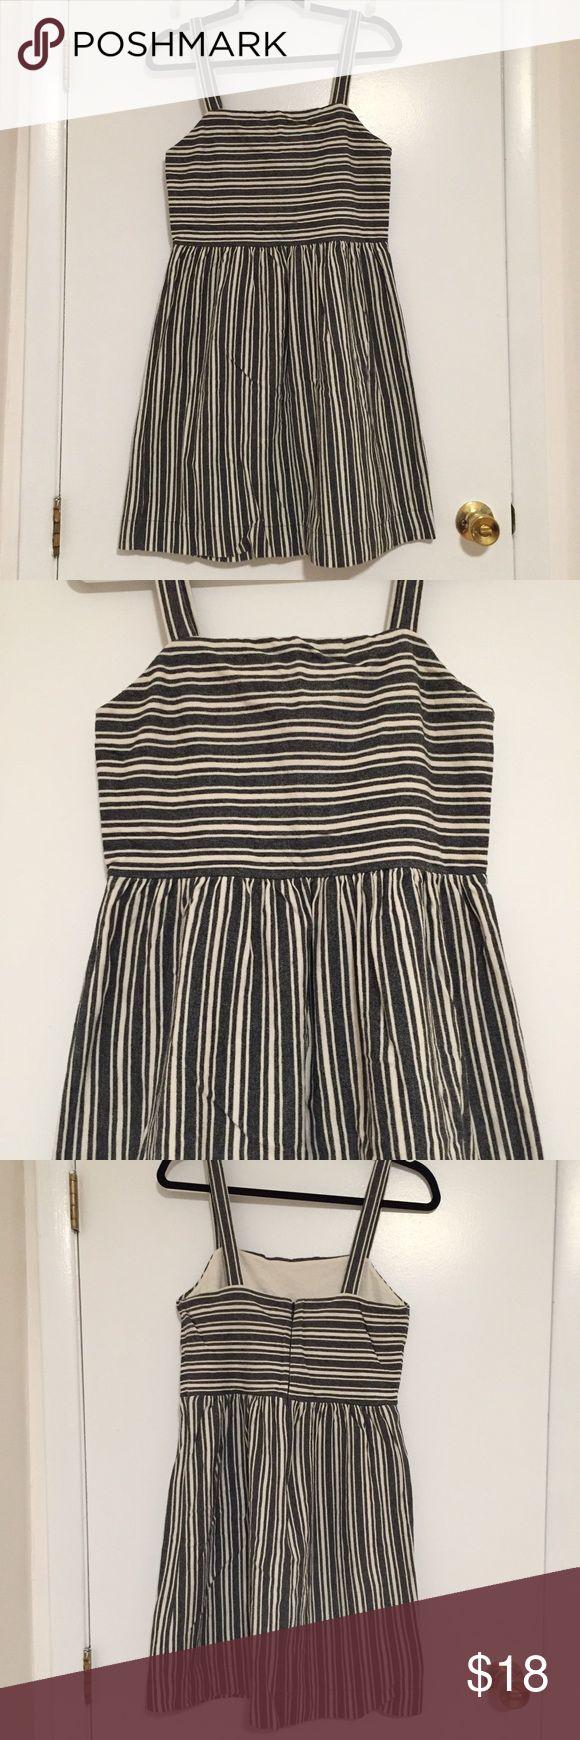 🎉Wknd Sale! Cute Striped Summer Dress Pretty striped summer dress. Not sheer! 🚫No Trade LOFT Dresses